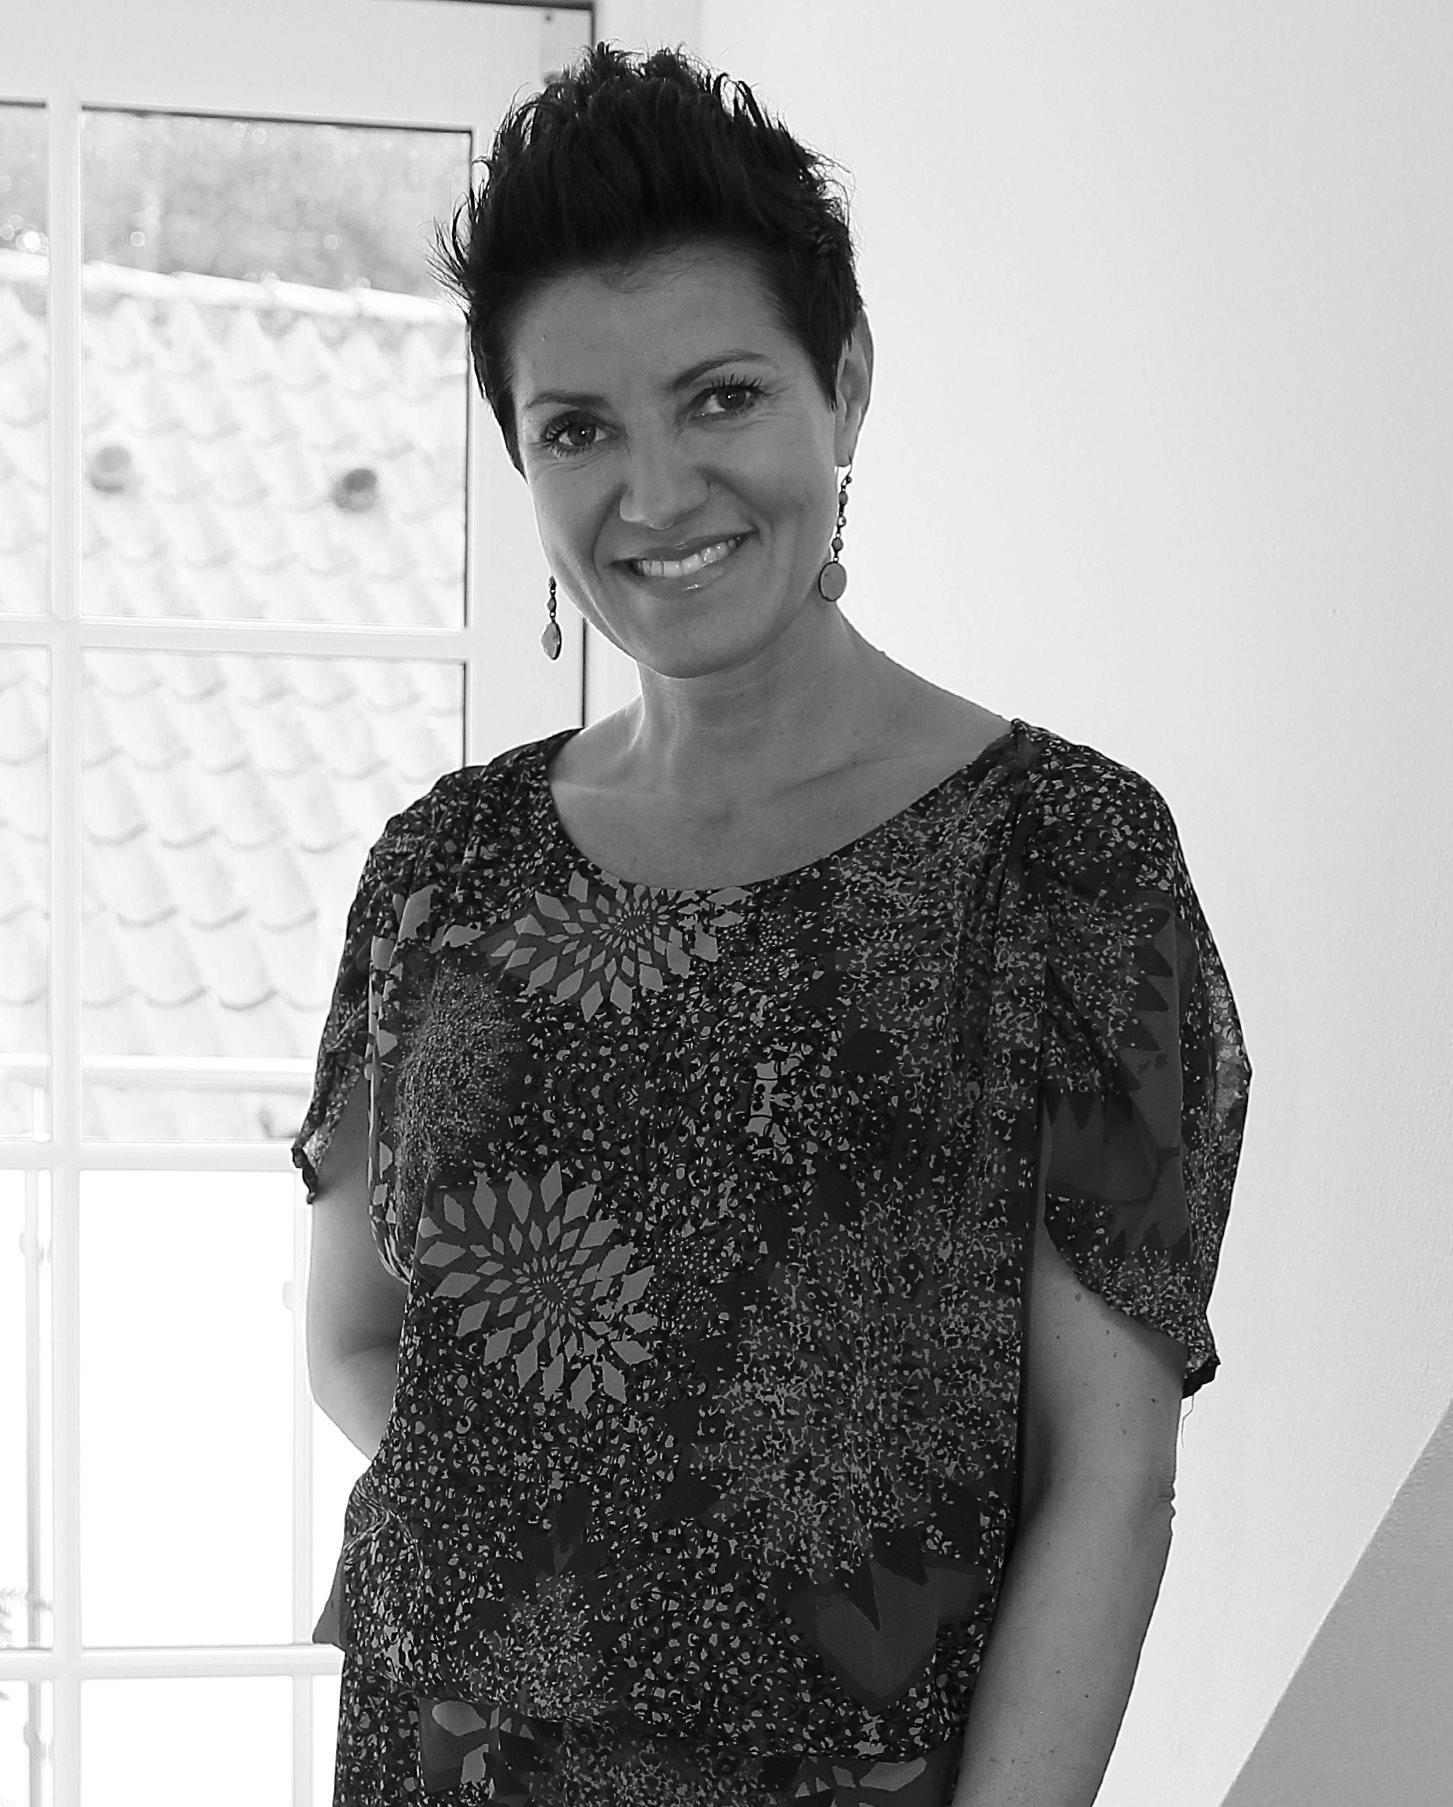 Camilla Ropers